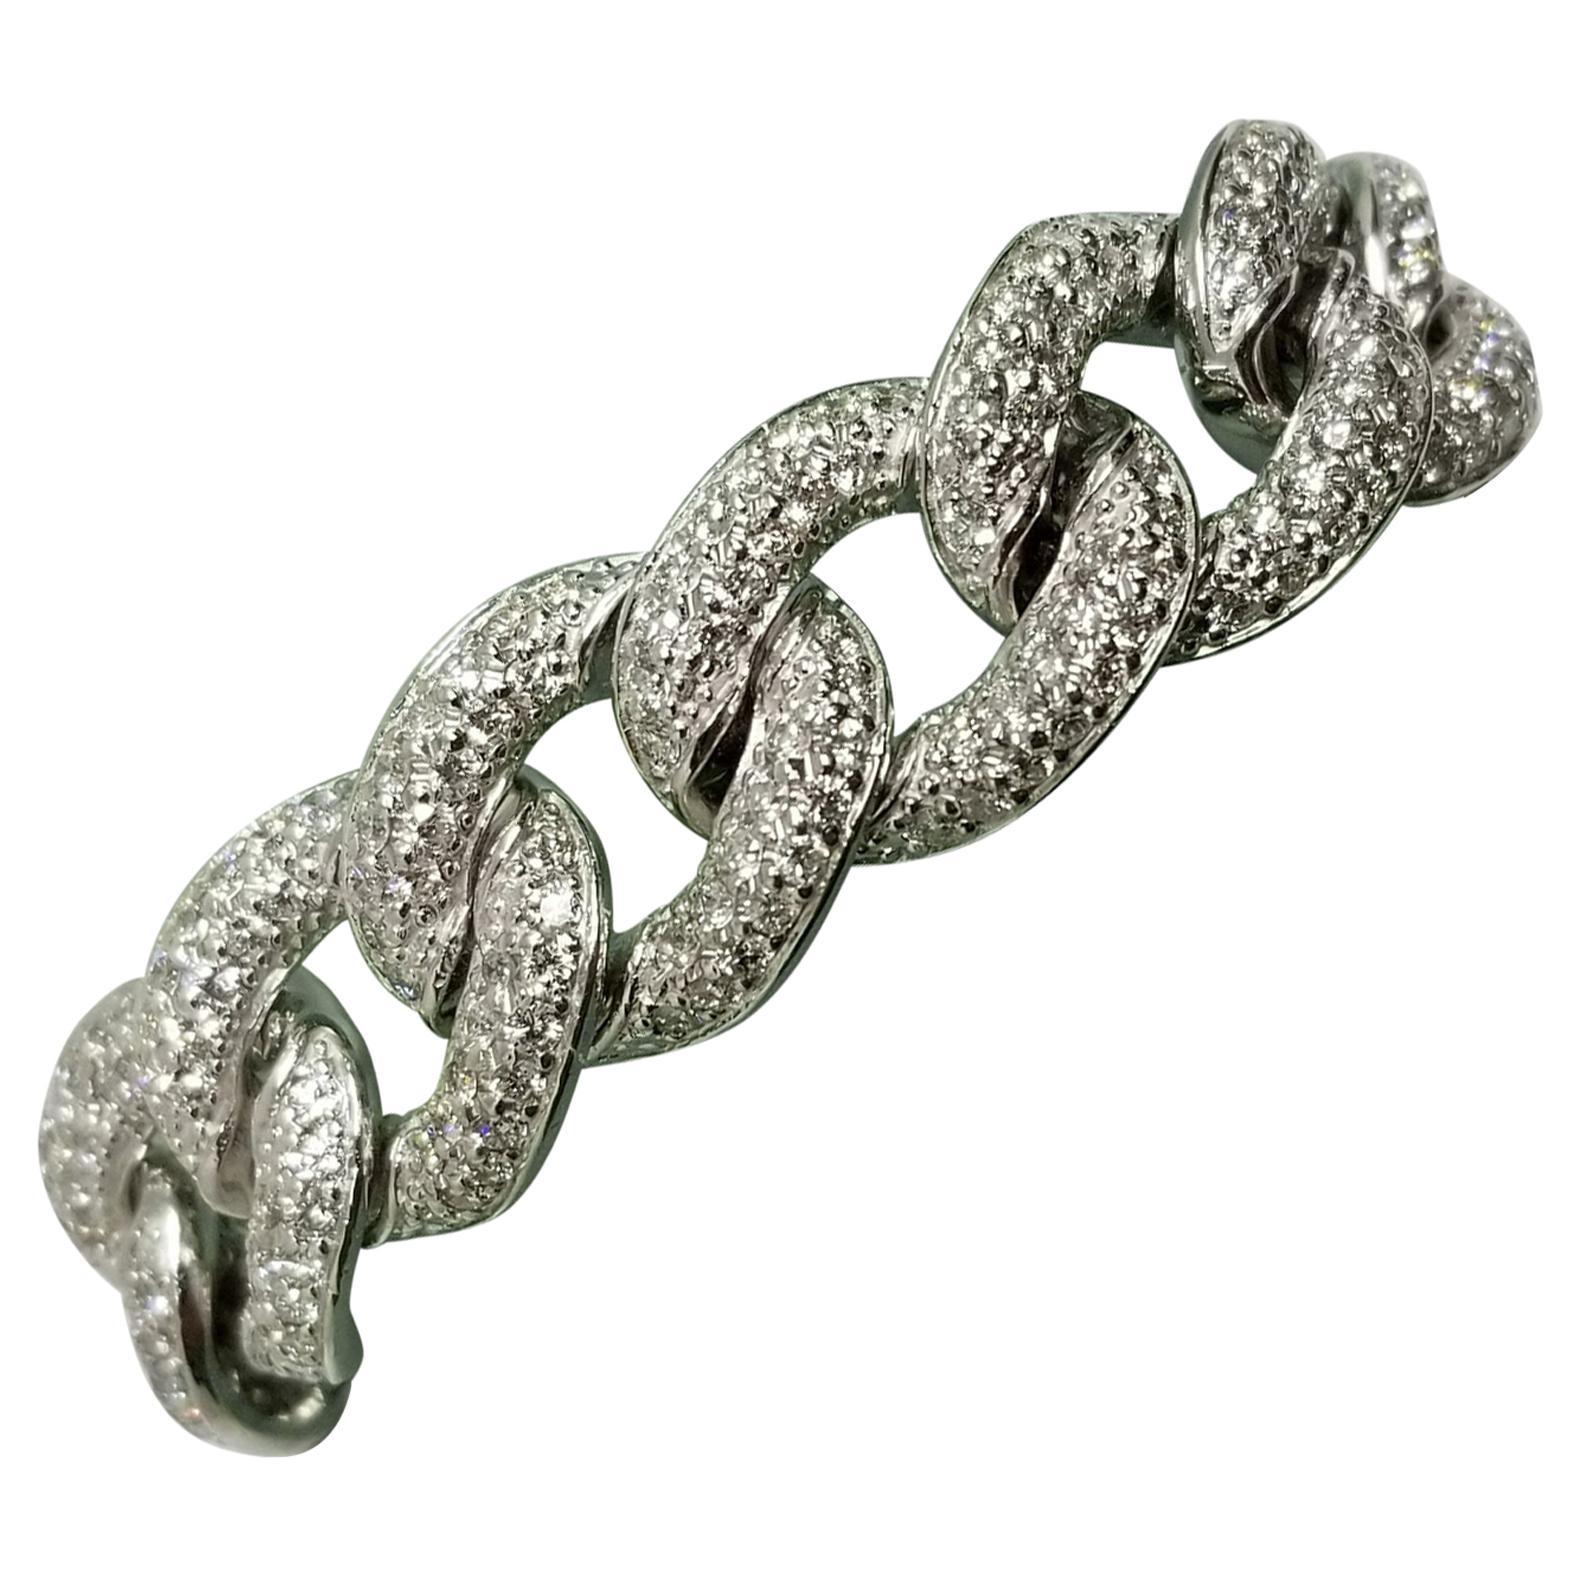 14 Karat White Gold Men's Large Diamond Pave Link Bracelet